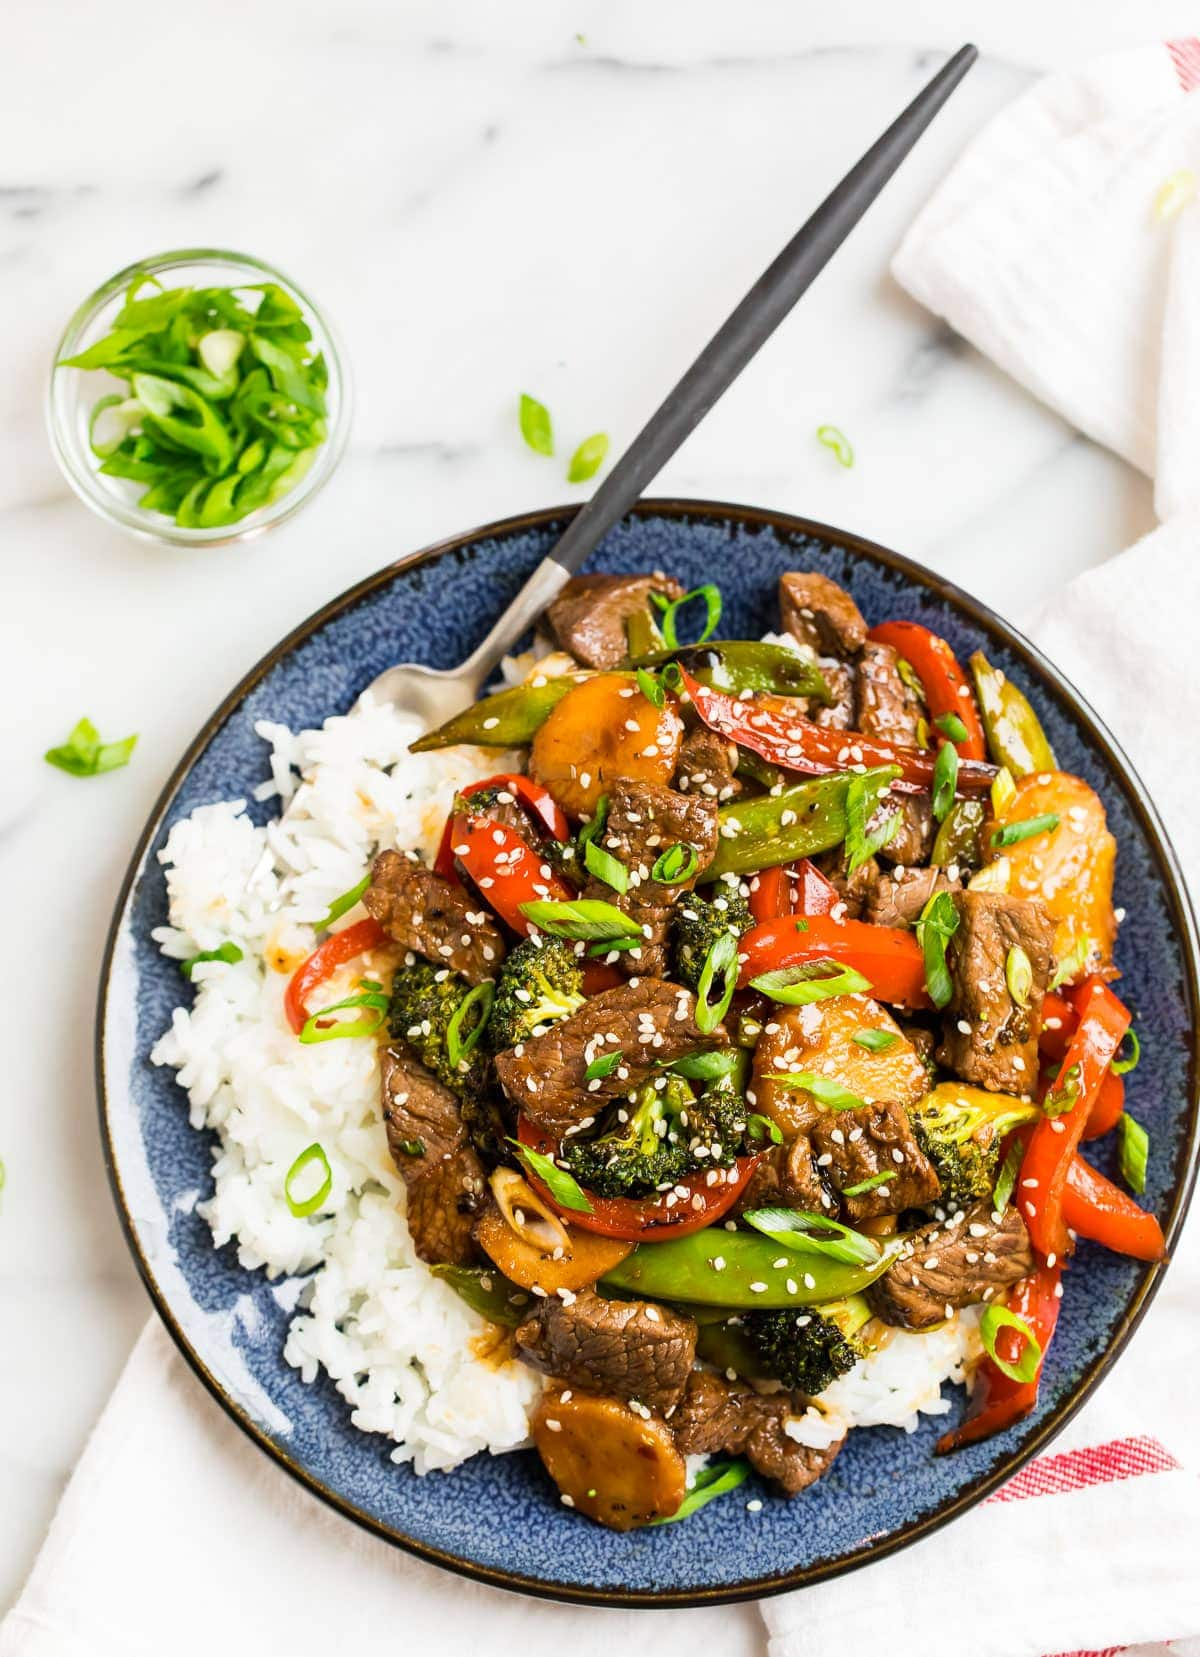 chop steak stir fry recipe Teriyaki Beef Stir Fry